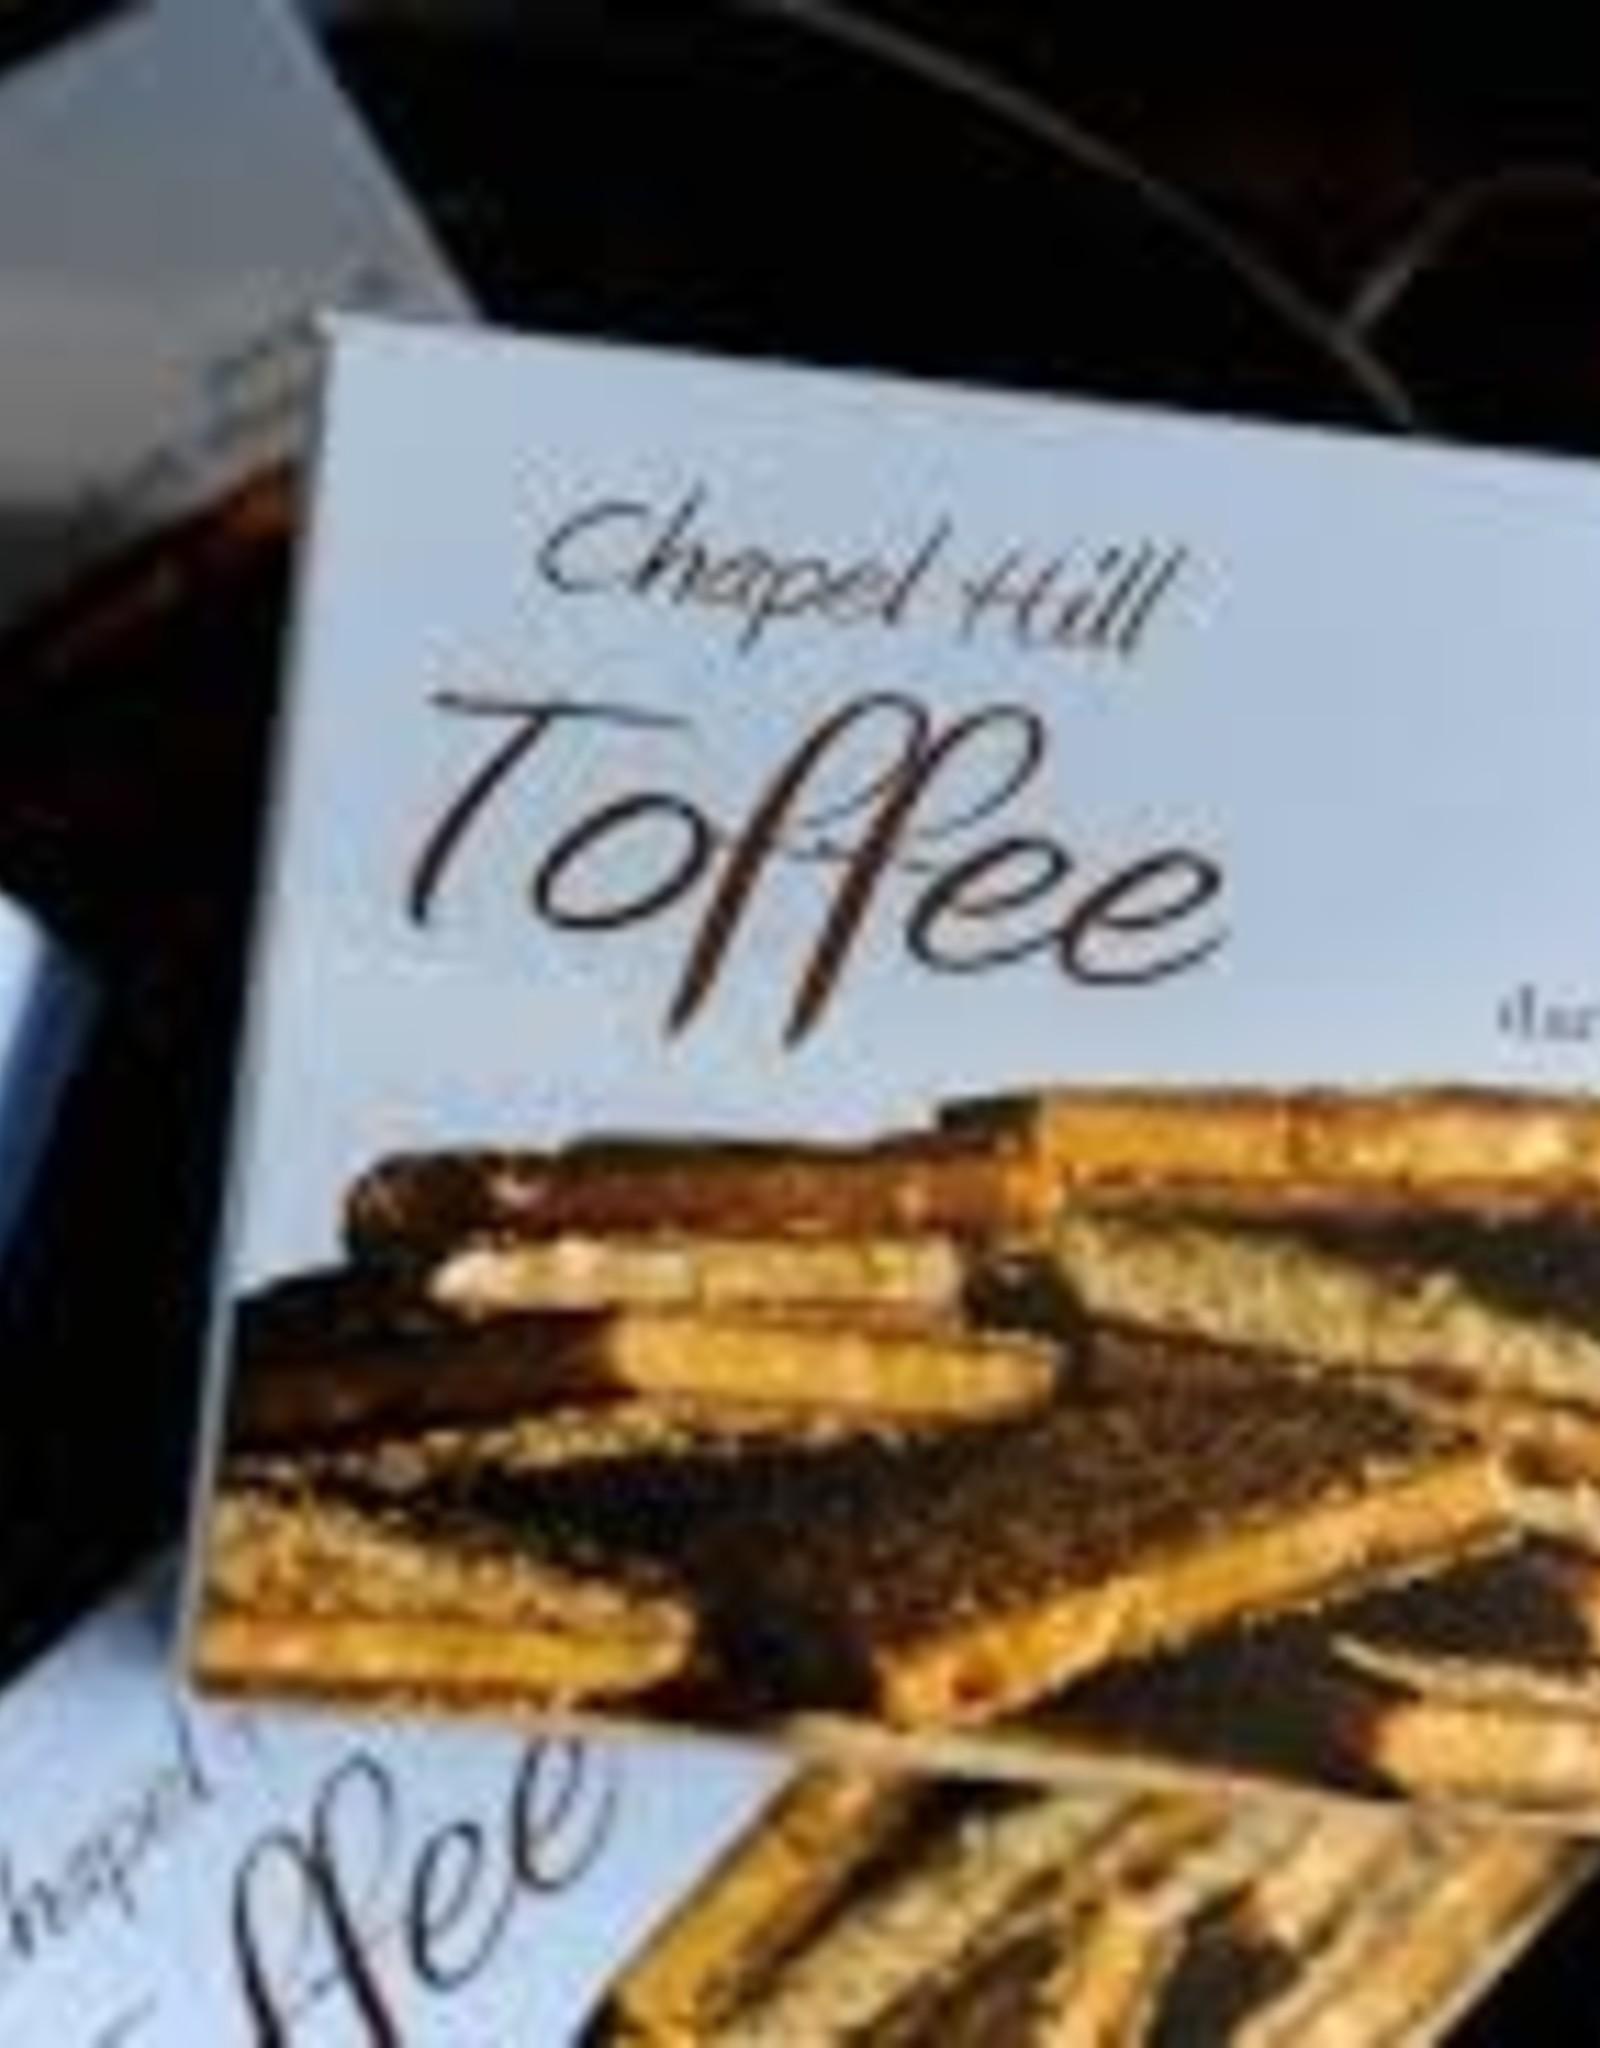 Chapel Hill Toffee Chapel Hill Toffee - Dark Chocolate - 10 oz